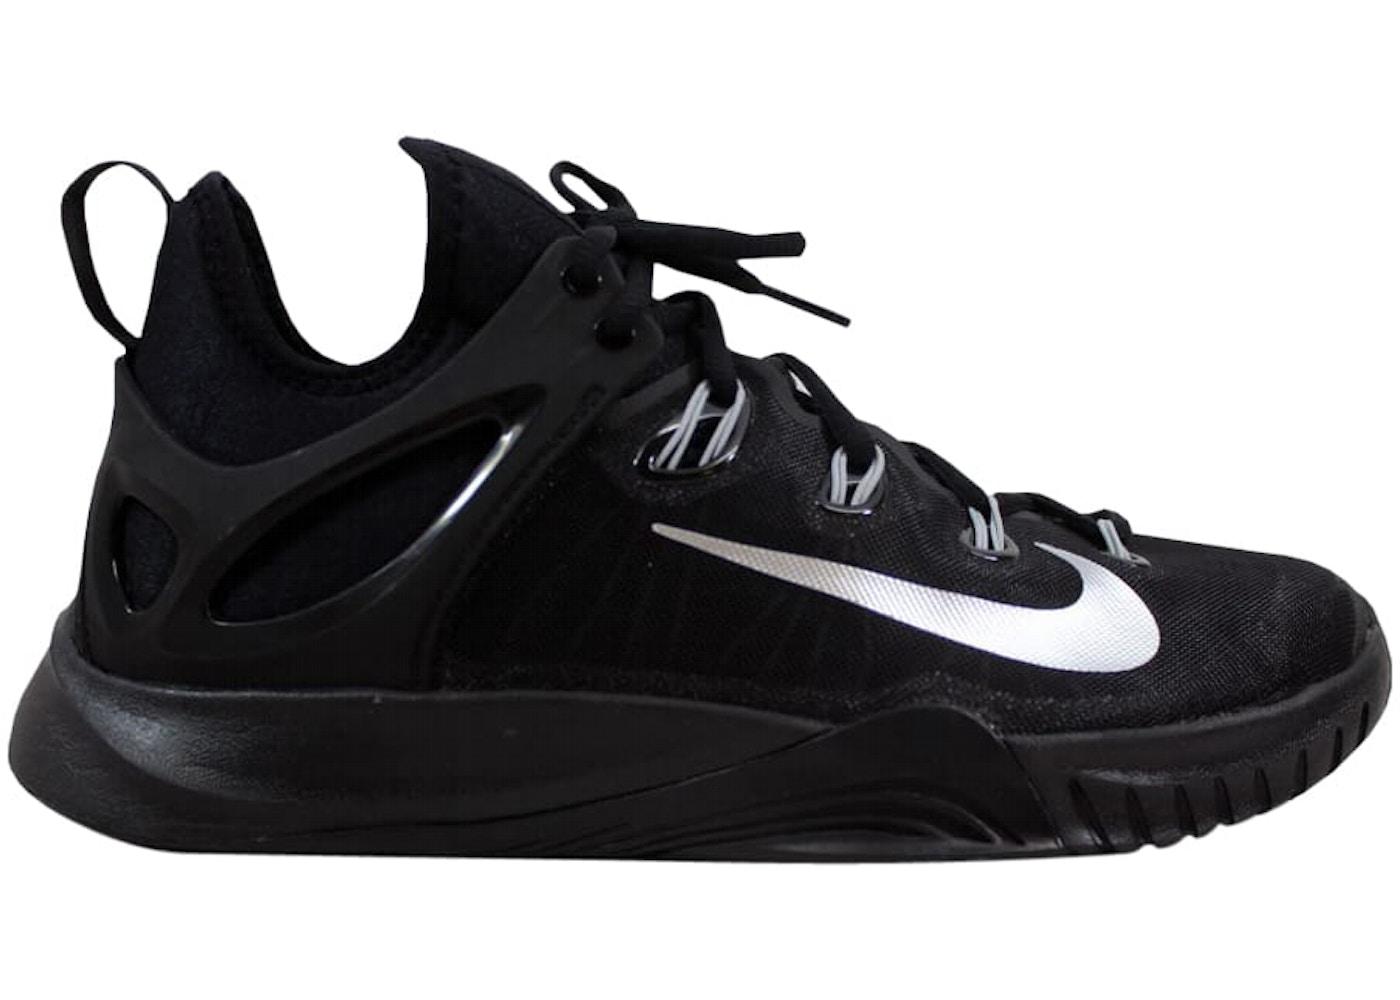 sports shoes a0ed3 1ffa0 Nike Zoom Hyperrev 2015 Black - 705370-001